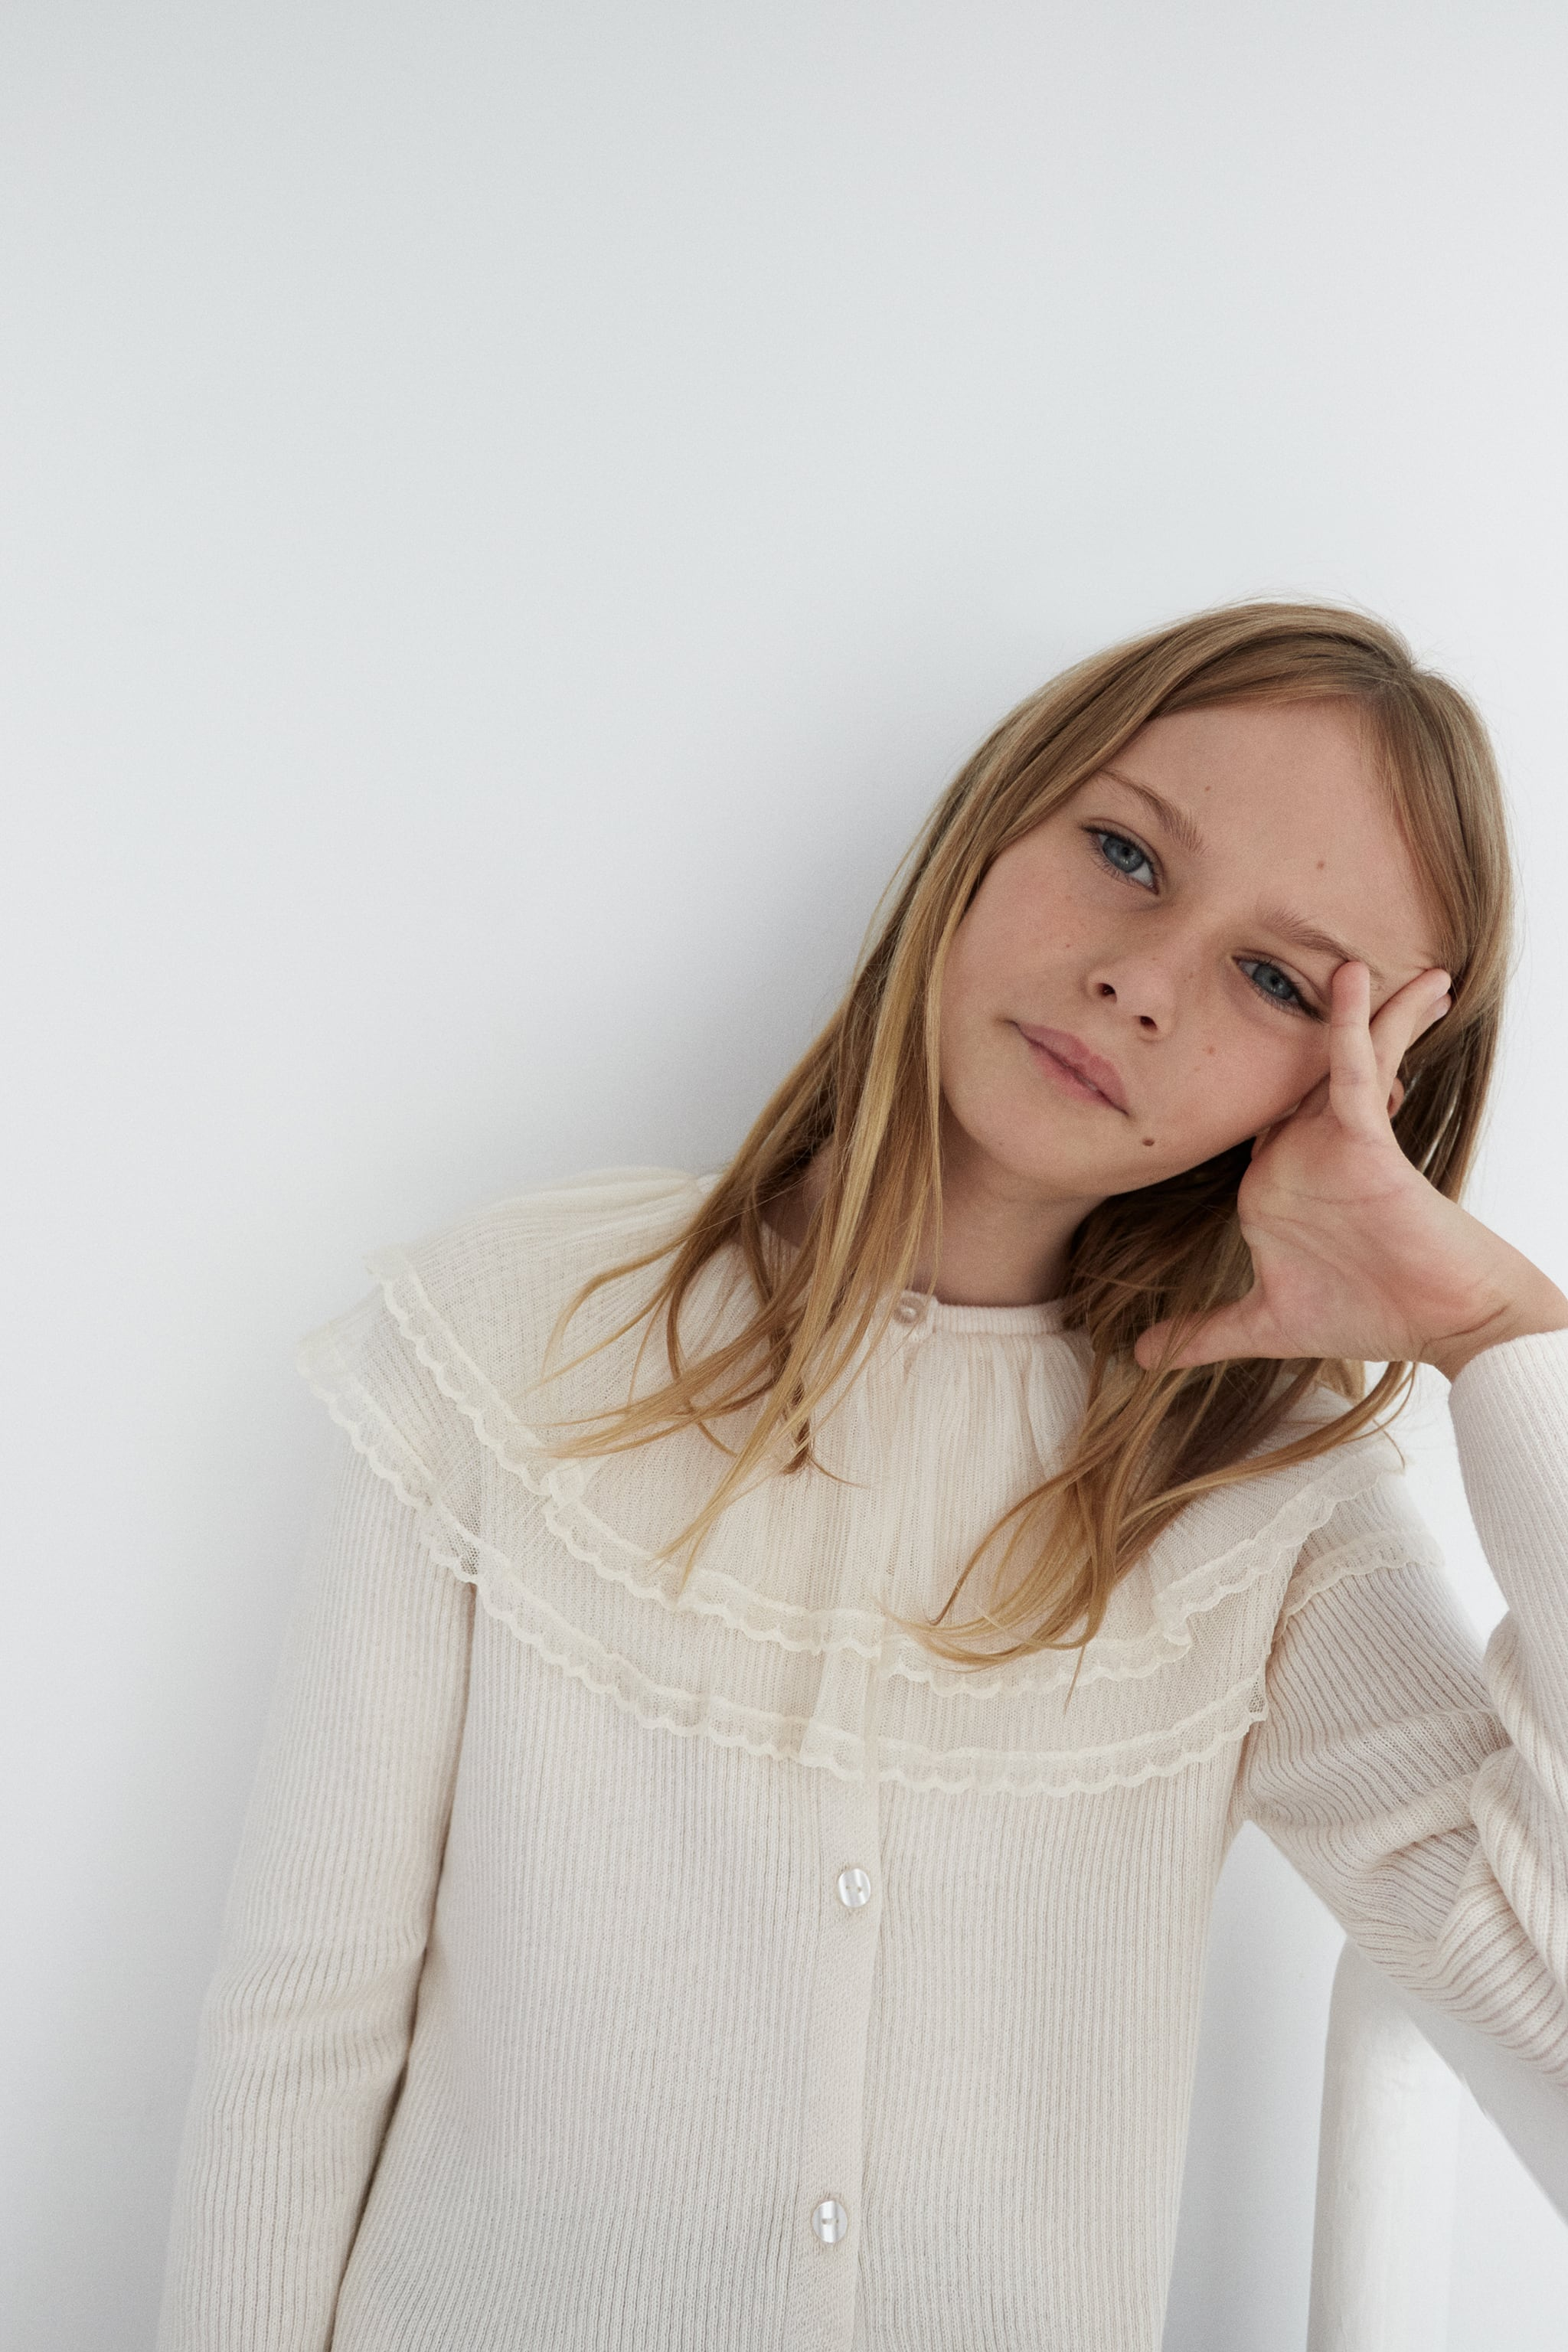 Zara KNIT CARDIGAN WITH TULLE RUFFLE